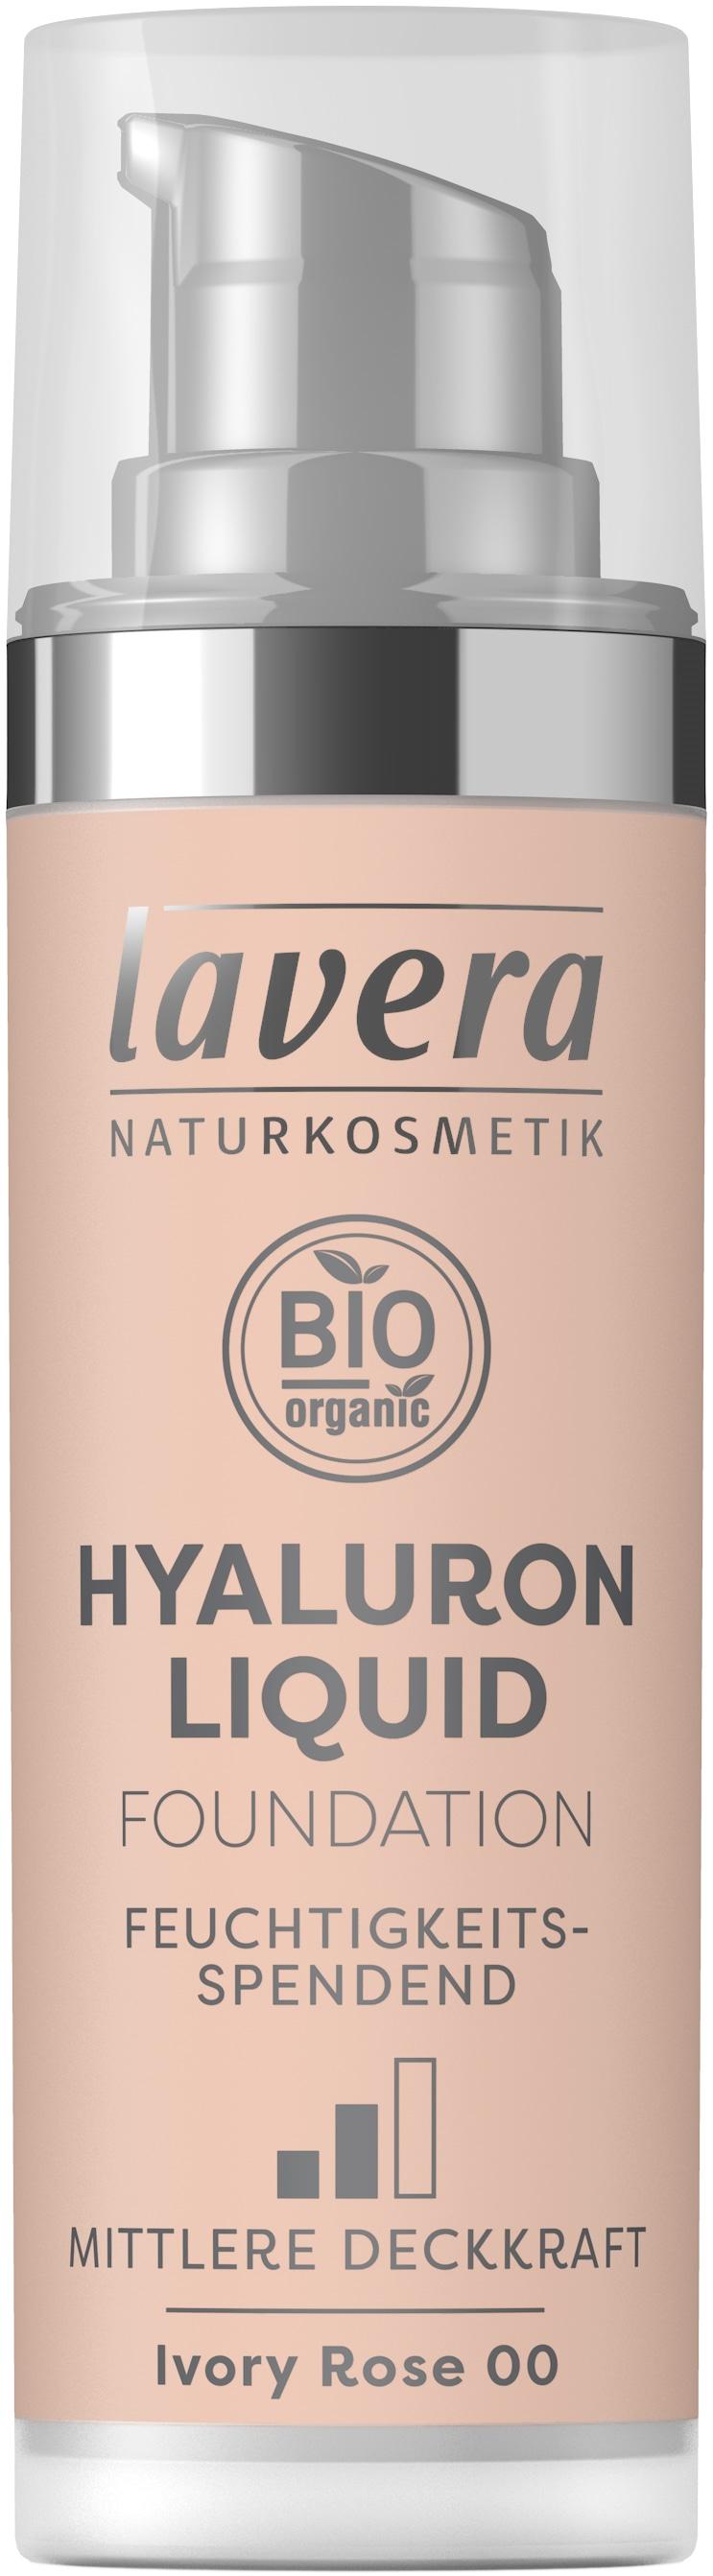 Hyaluron Liquid Foundation -Ivory Rose 00-